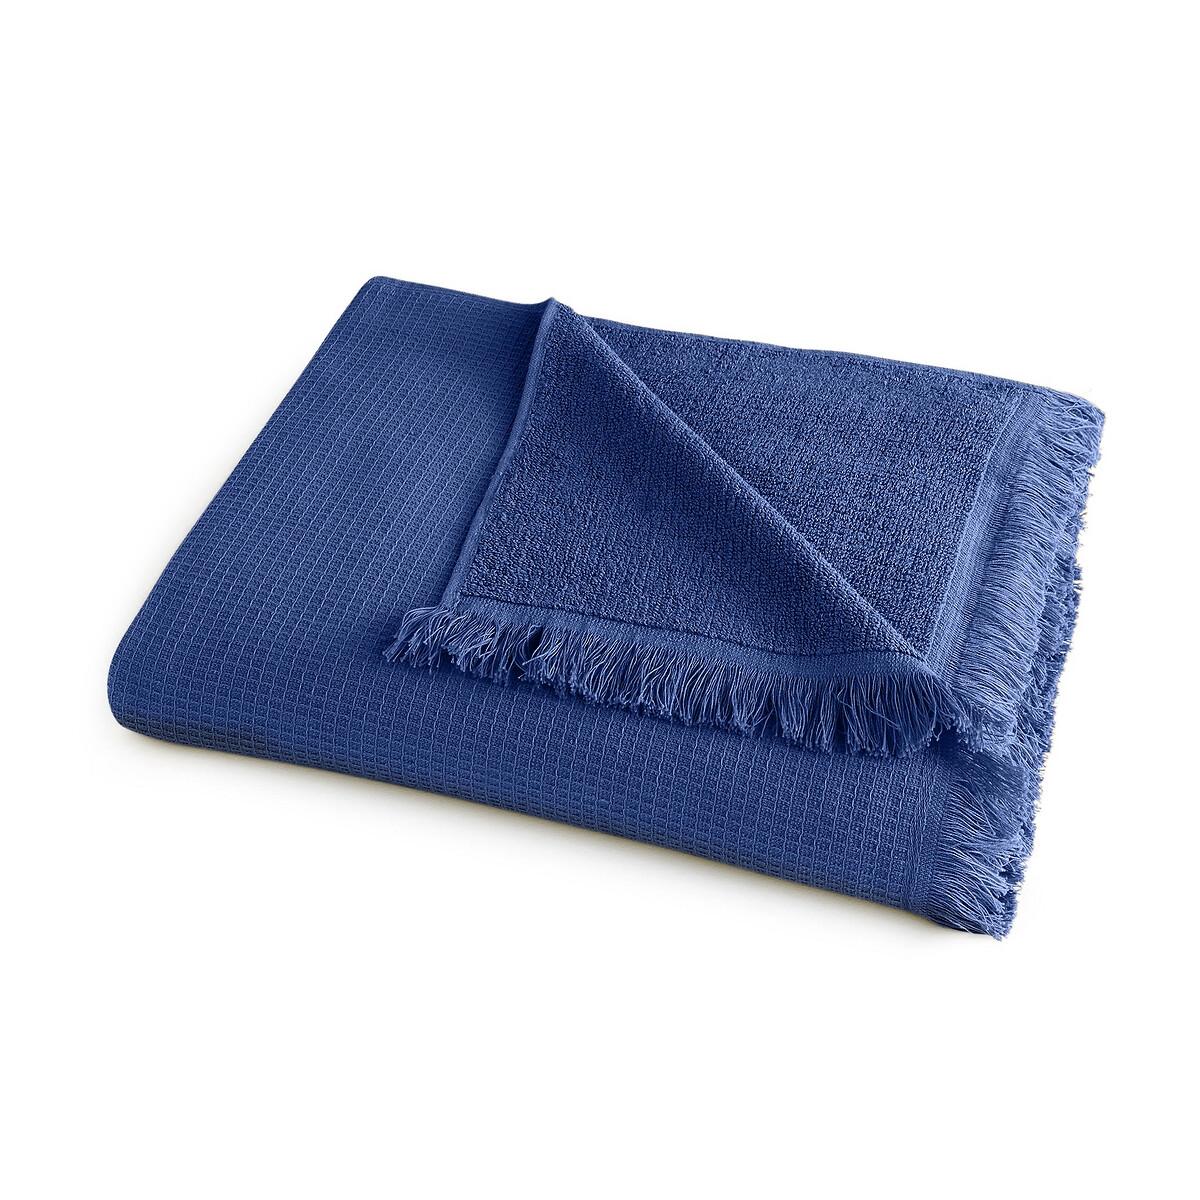 Полотенце La Redoute Банное из хлопка и льна Nipaly 70 x 140 см синий